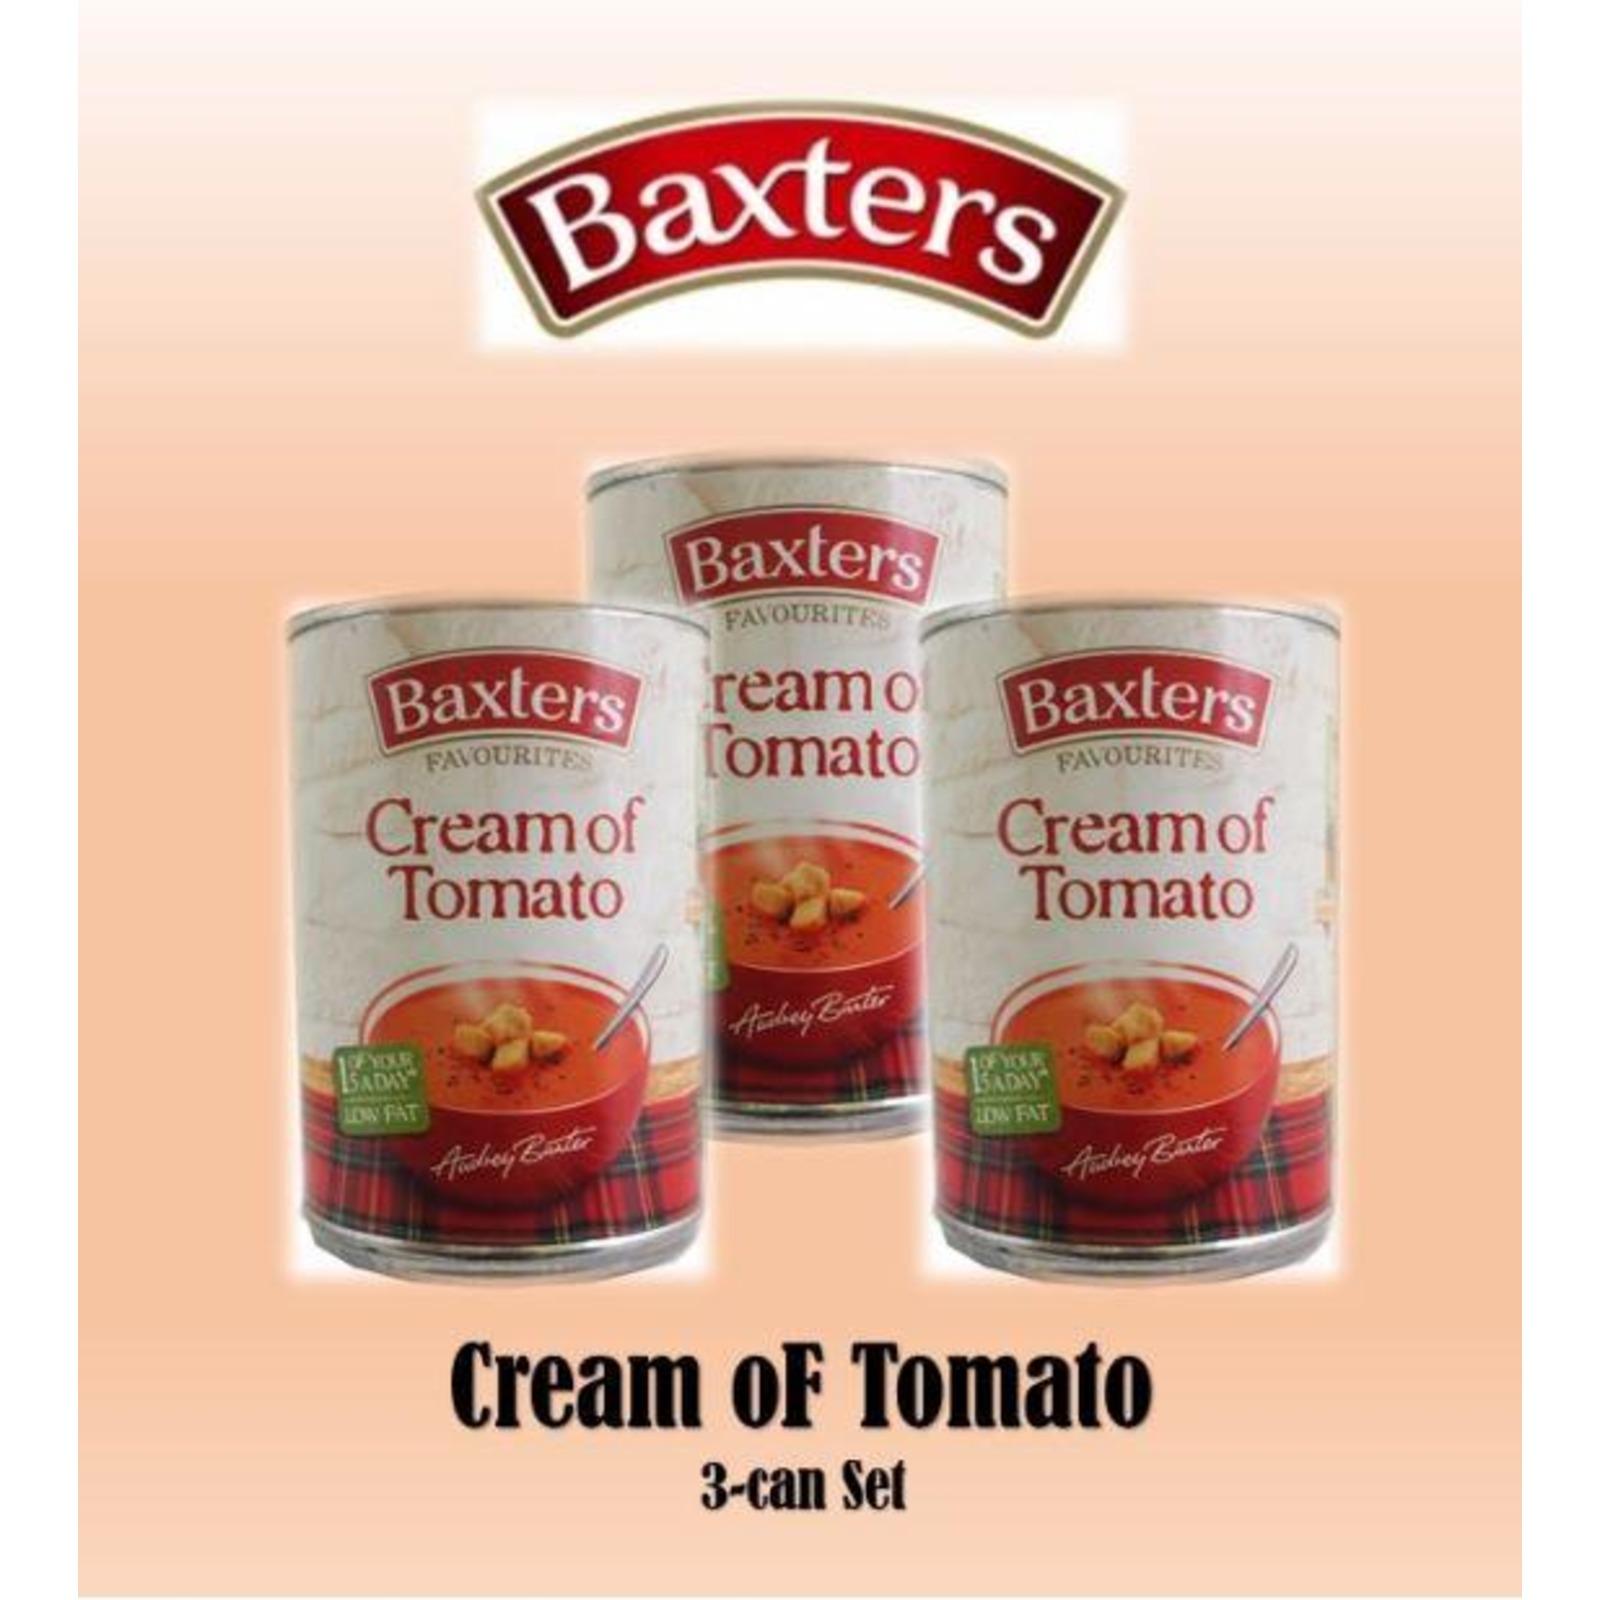 Baxters Cream of Tomato Soup